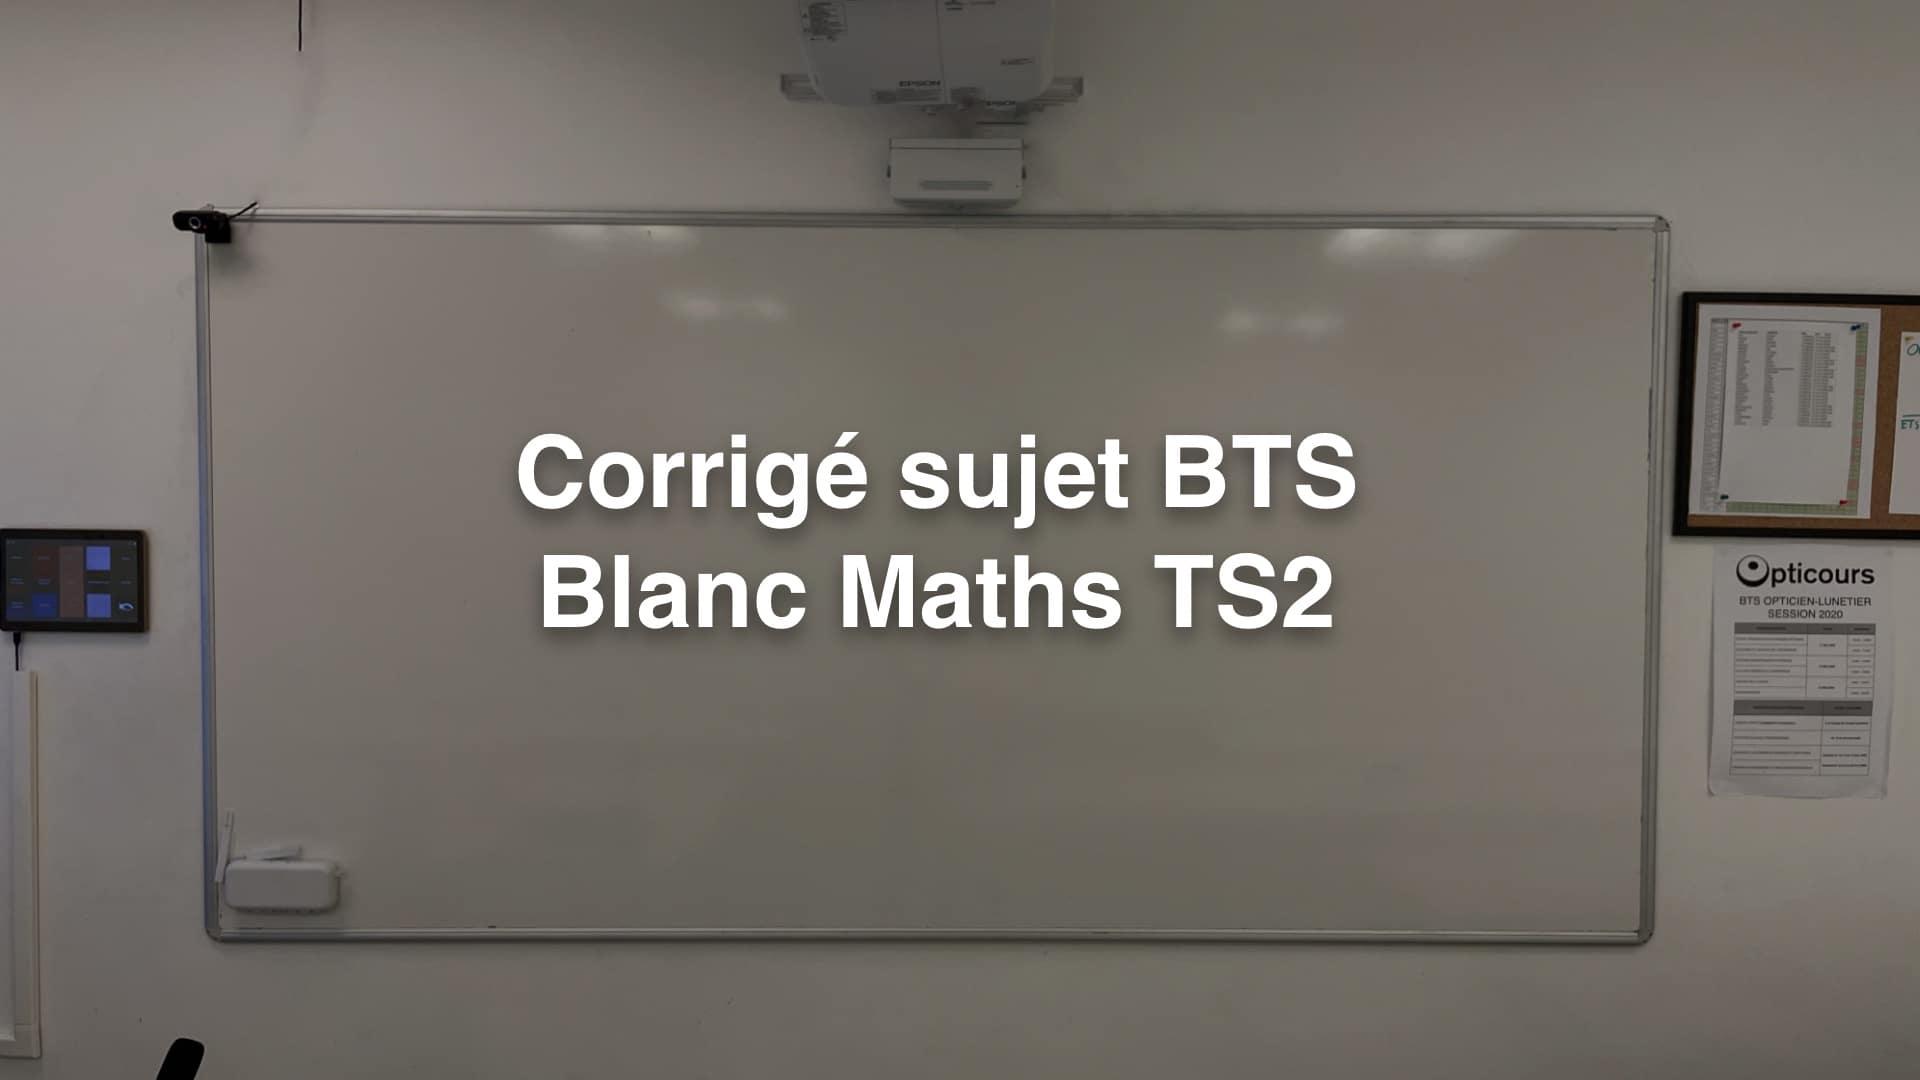 Corrigé sujet BTS Blanc Maths TS2